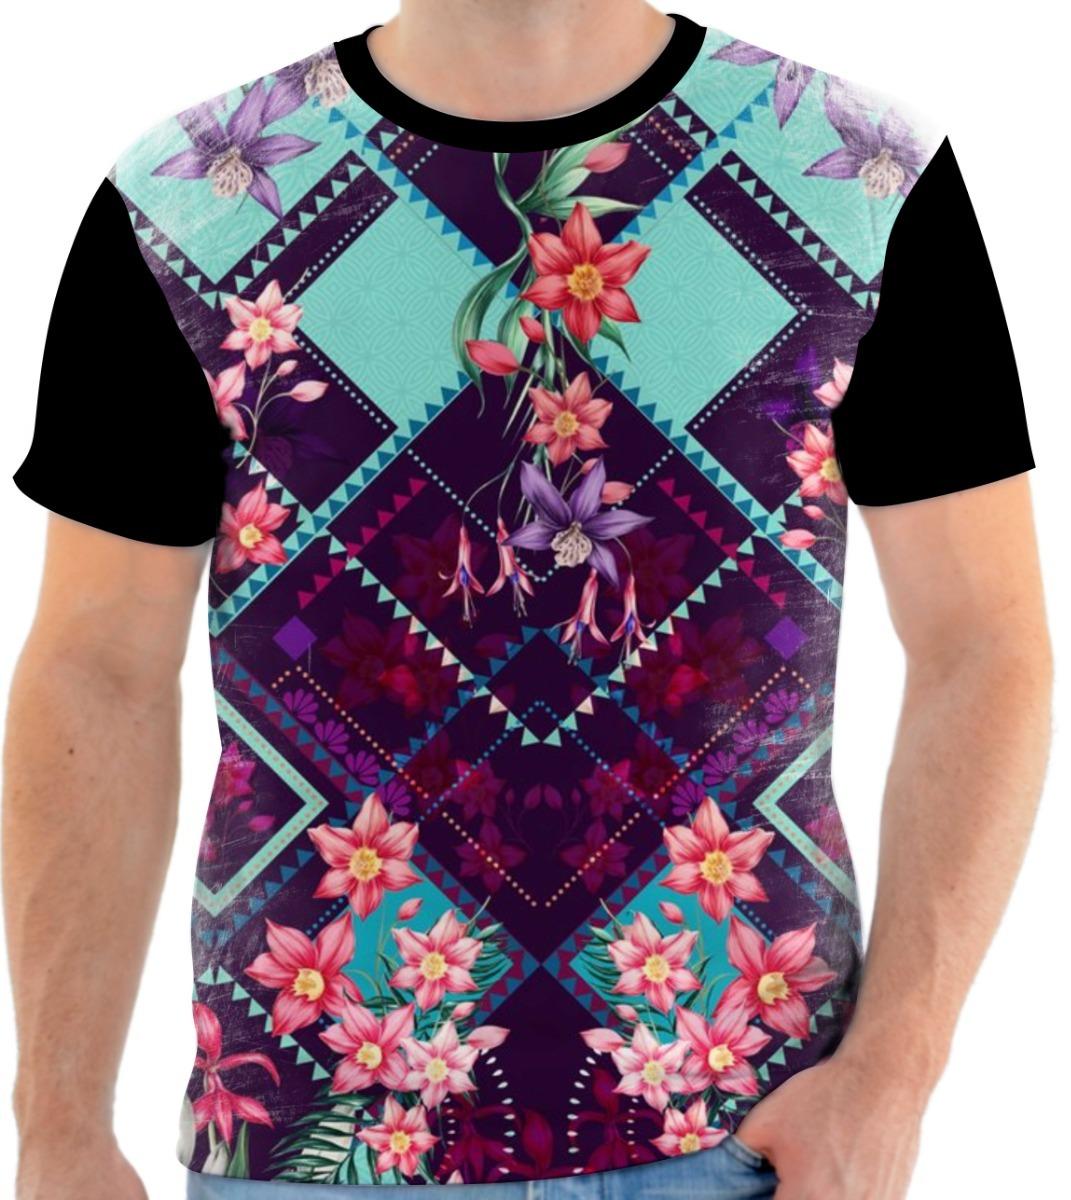 Camisa Camiseta Preta Estampa Floral 06 - R  59 ec6295728d4a2